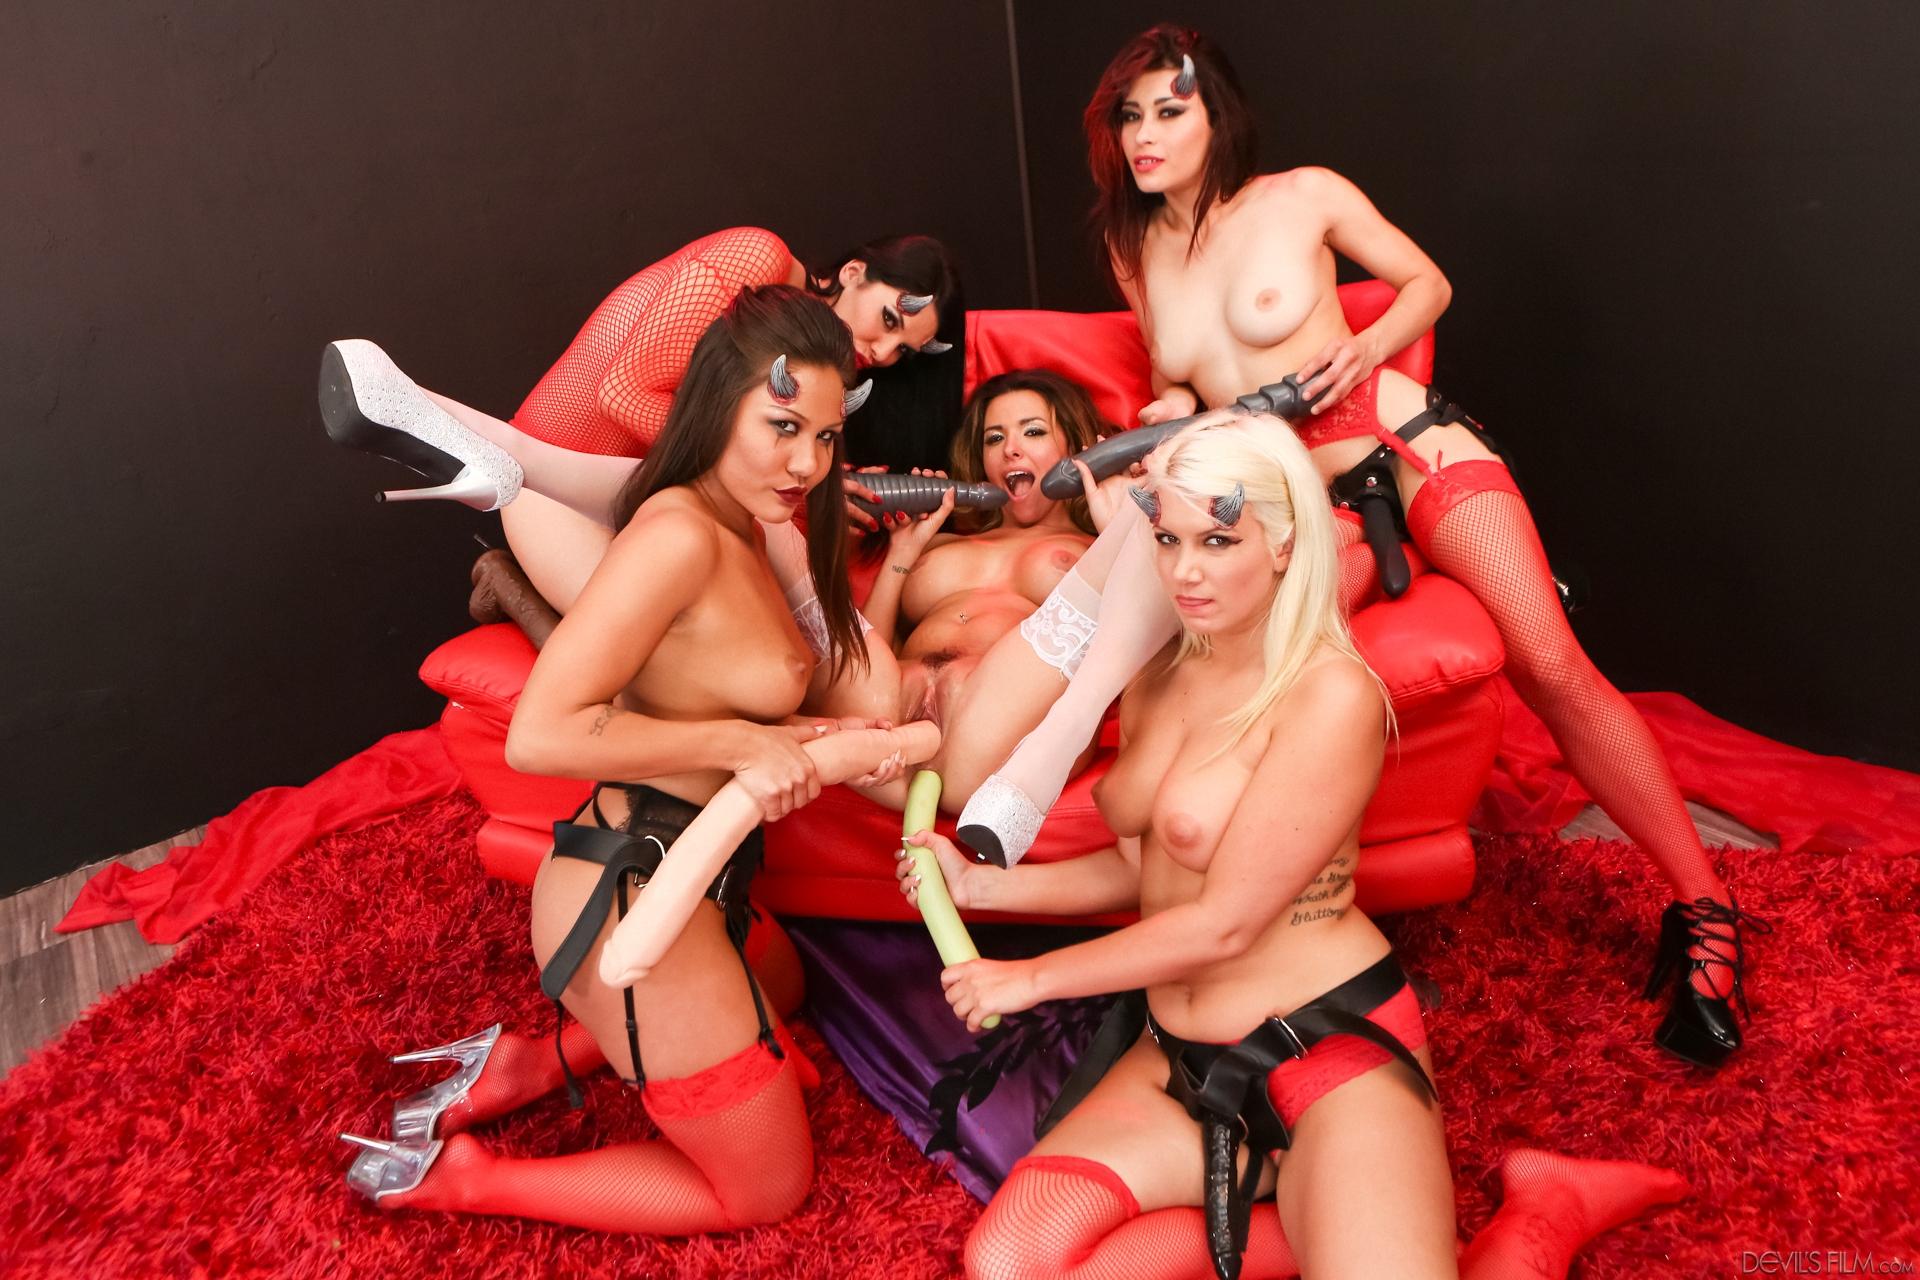 lesbian anal strapoon orgy #3